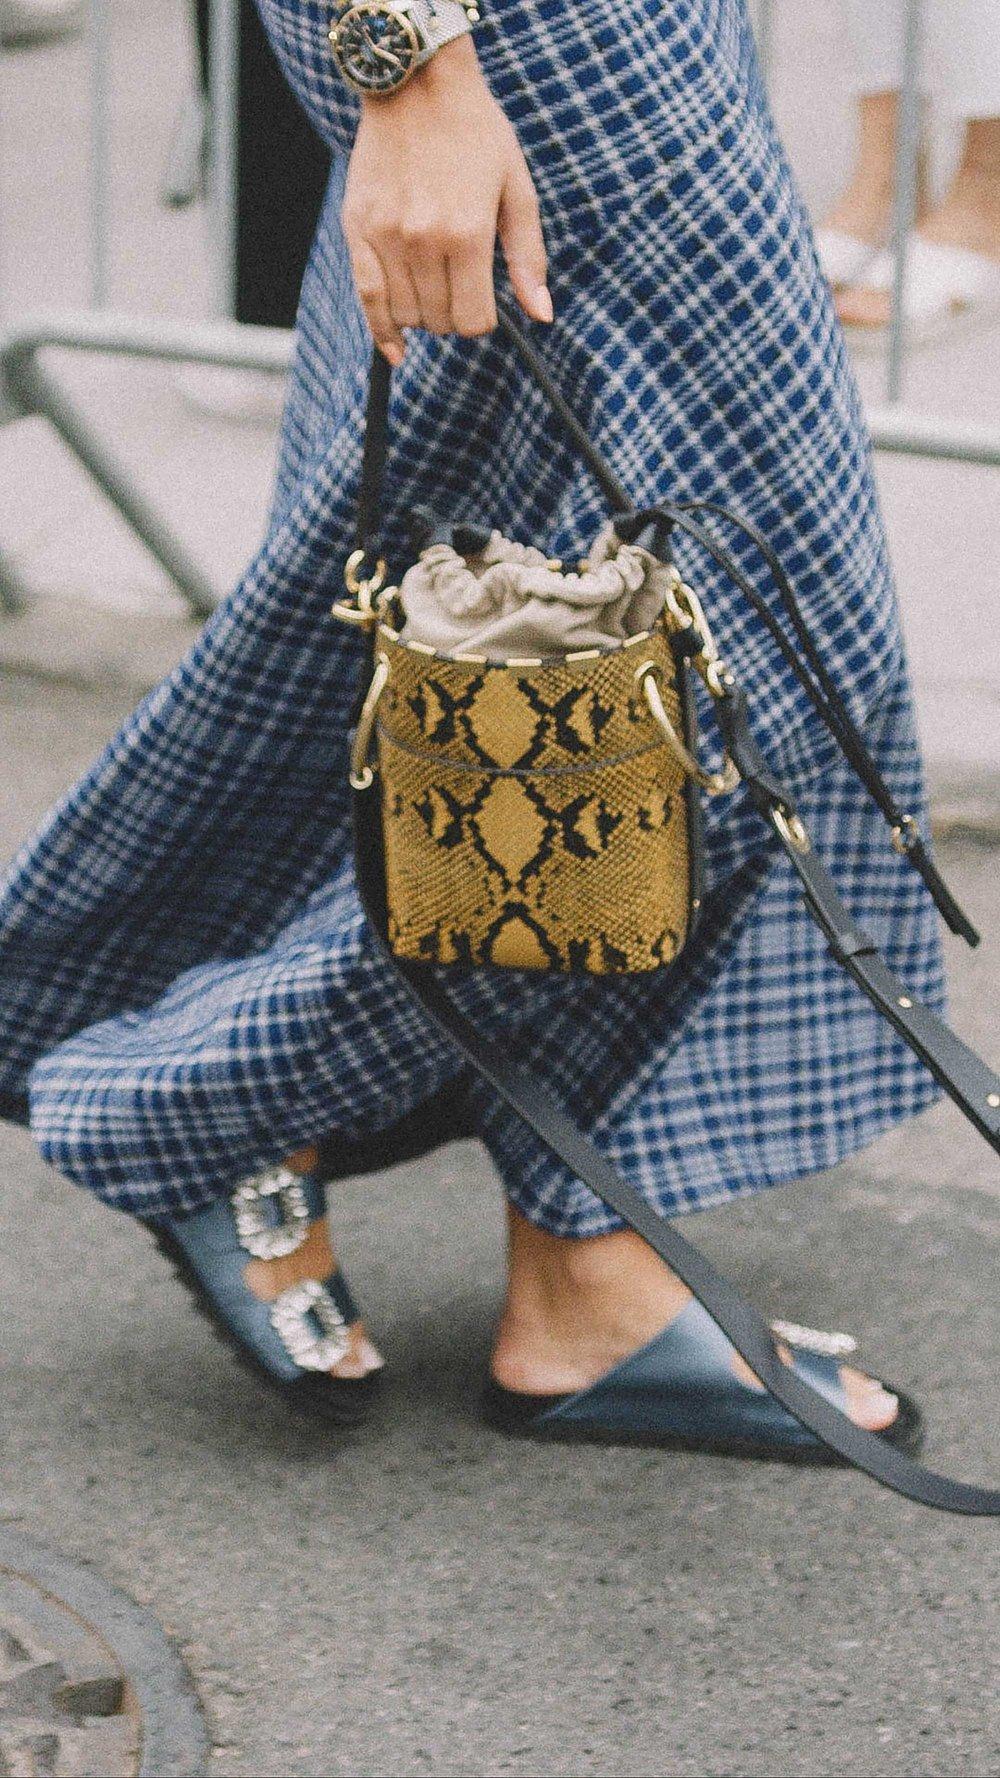 12 Best Chloe bags of Fashion Week -  CHLOe Roy mini leather bucket bag and Chloe Small Tess Leather Shoulder Bag4.jpg